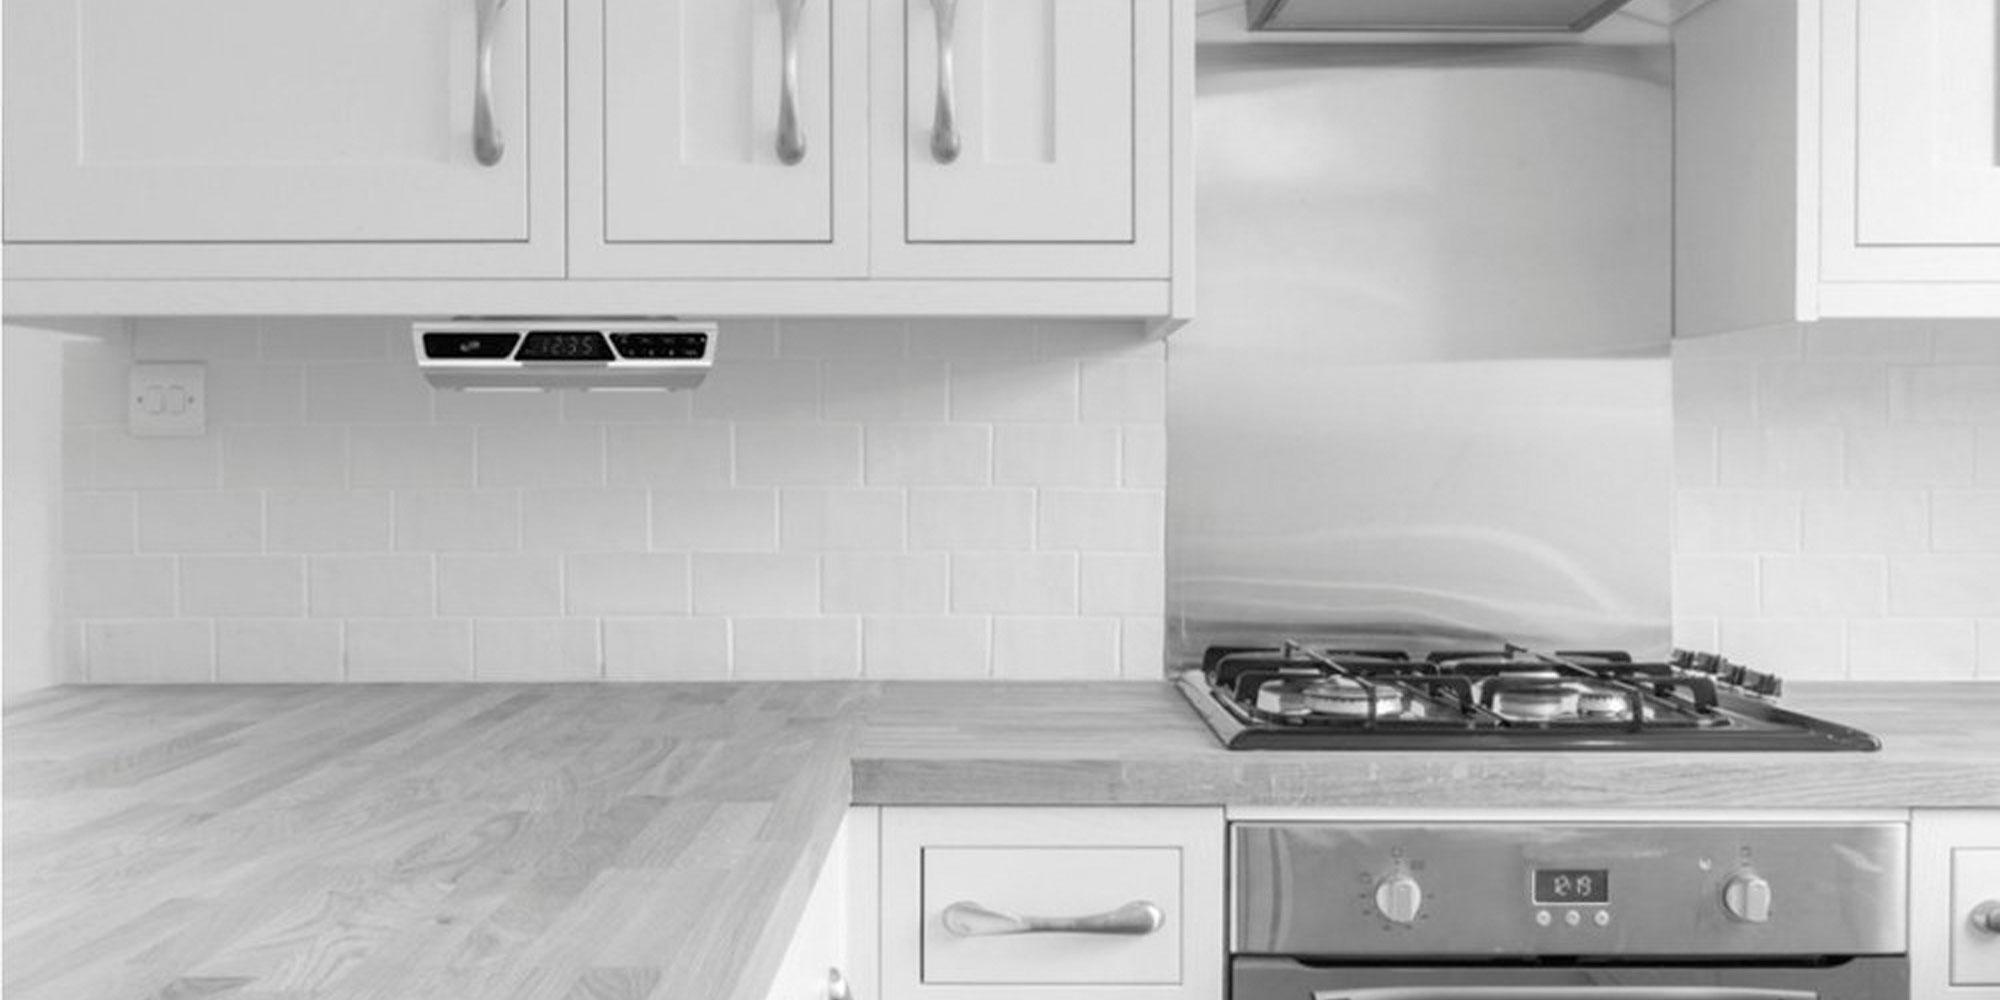 Enjoy Alexa in the kitchen w/ iLive's under-cabinet smart speaker for $48 shipped (Reg. $100)